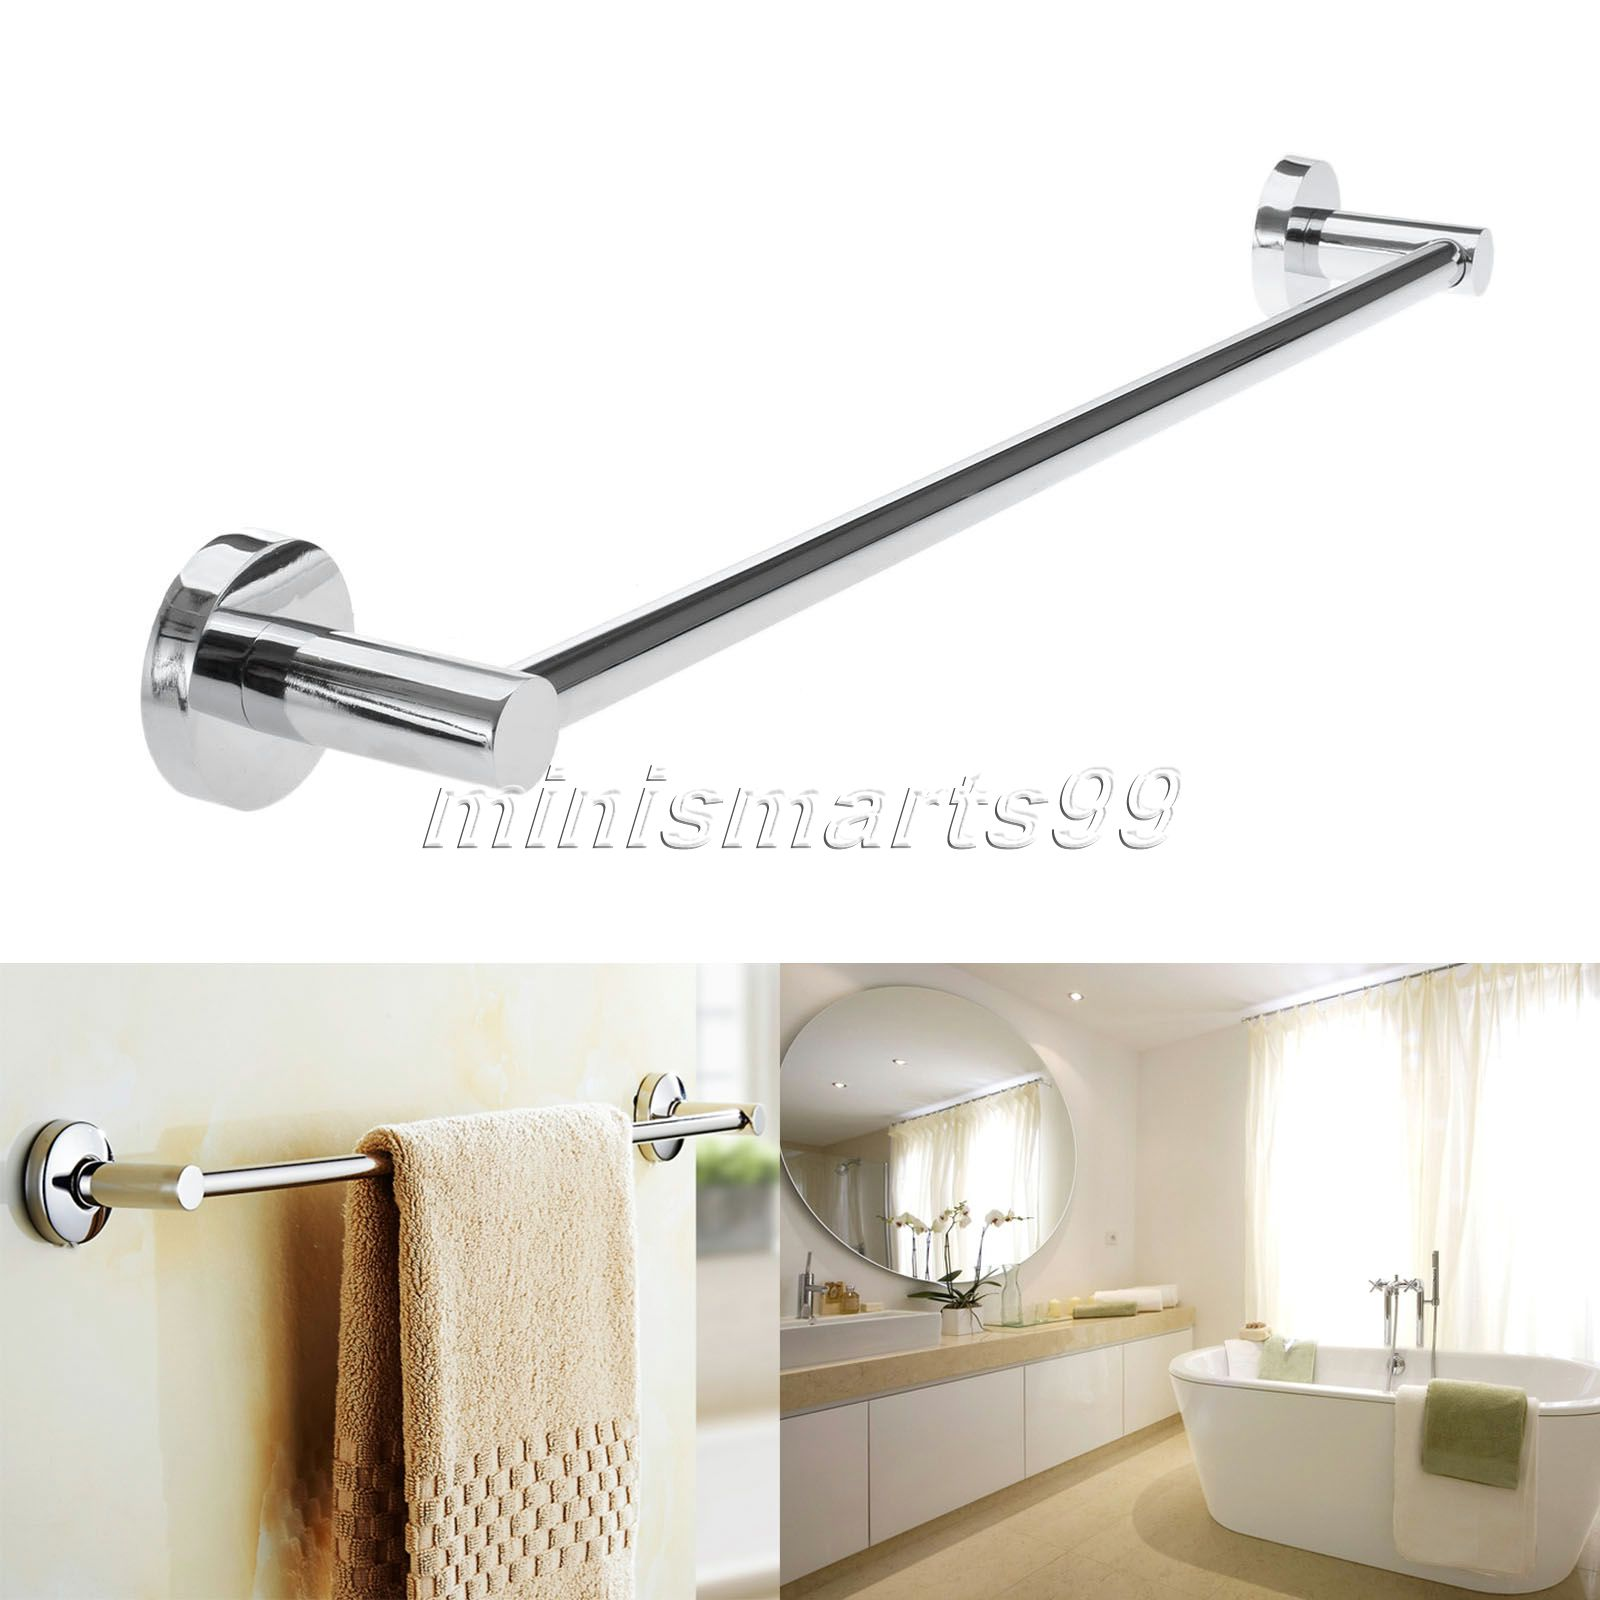 Bathroom wall towel racks - 60cm Steel Towel Rack Holder Wall Mounted Bathroom Towel Holders Single Pole Towel Bars Bath